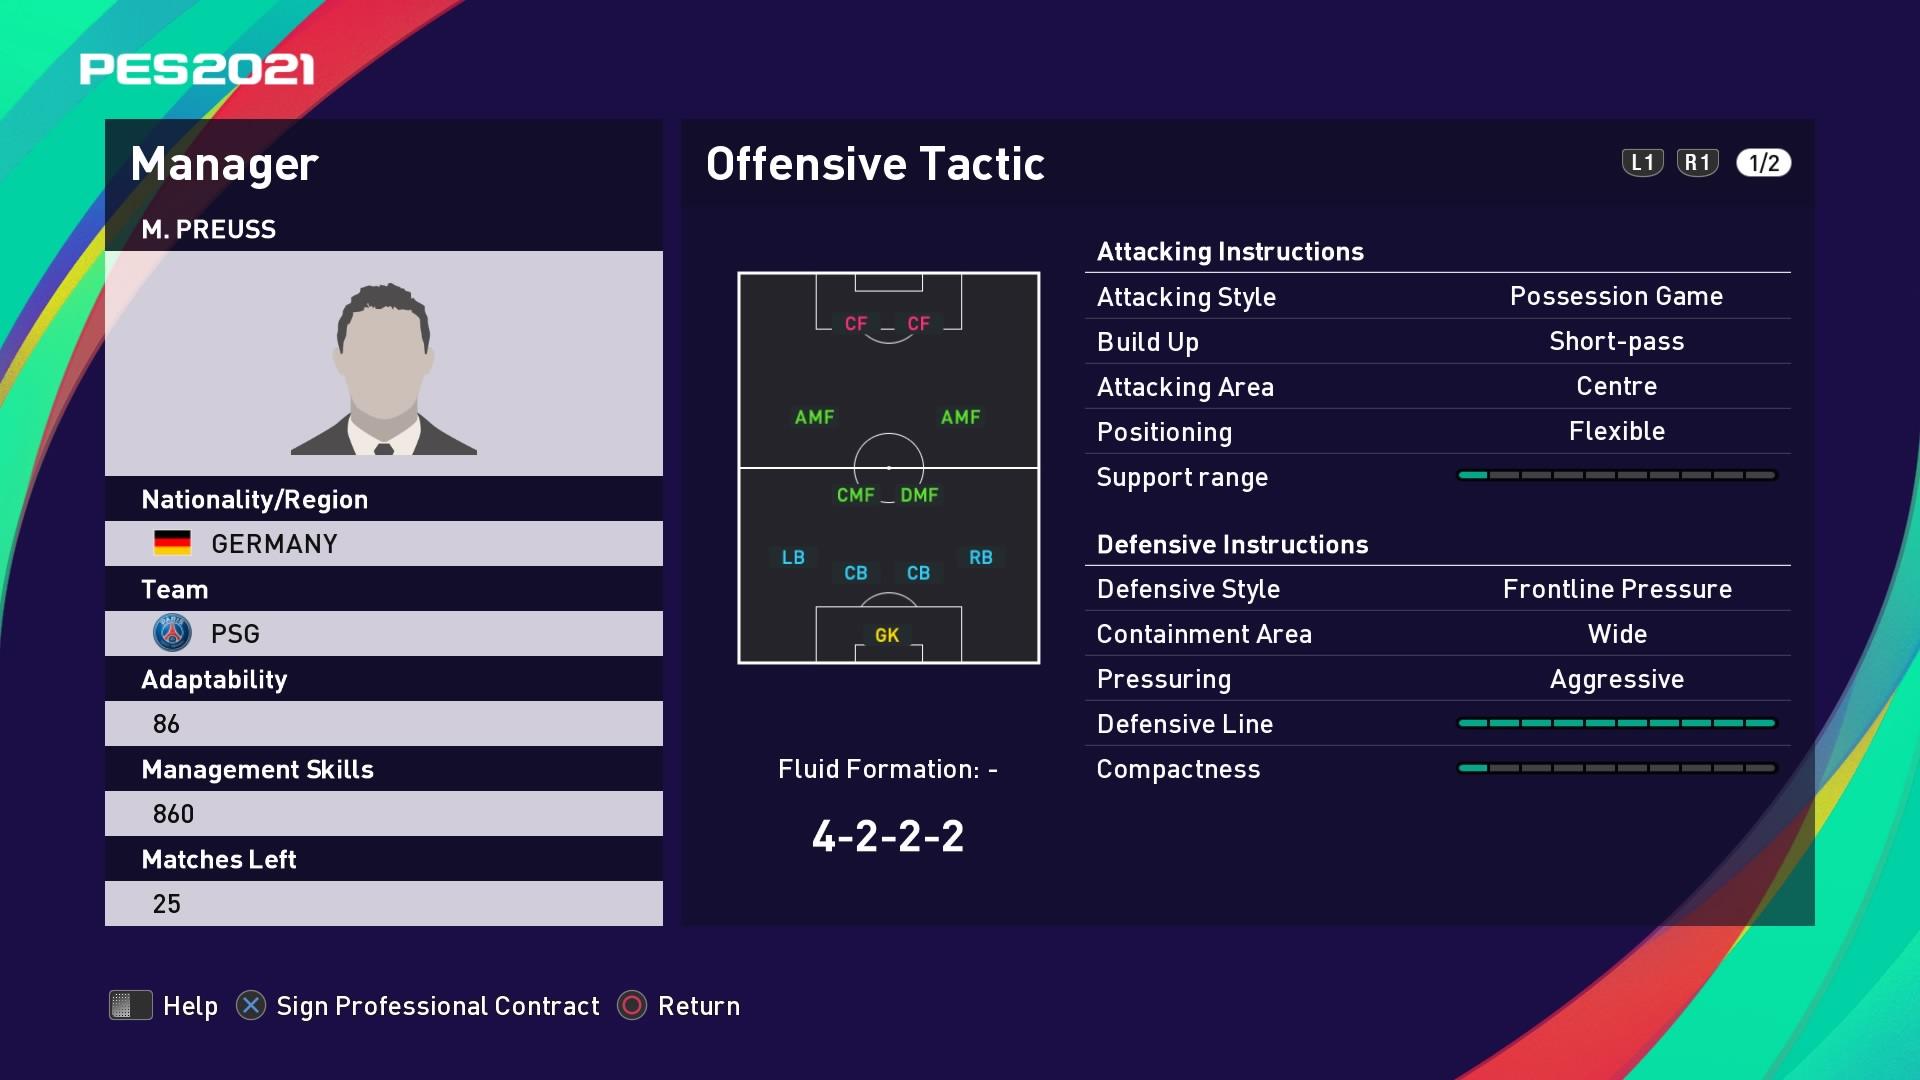 M. Preuss (Thomas Tuchel) Offensive Tactic in PES 2021 myClub